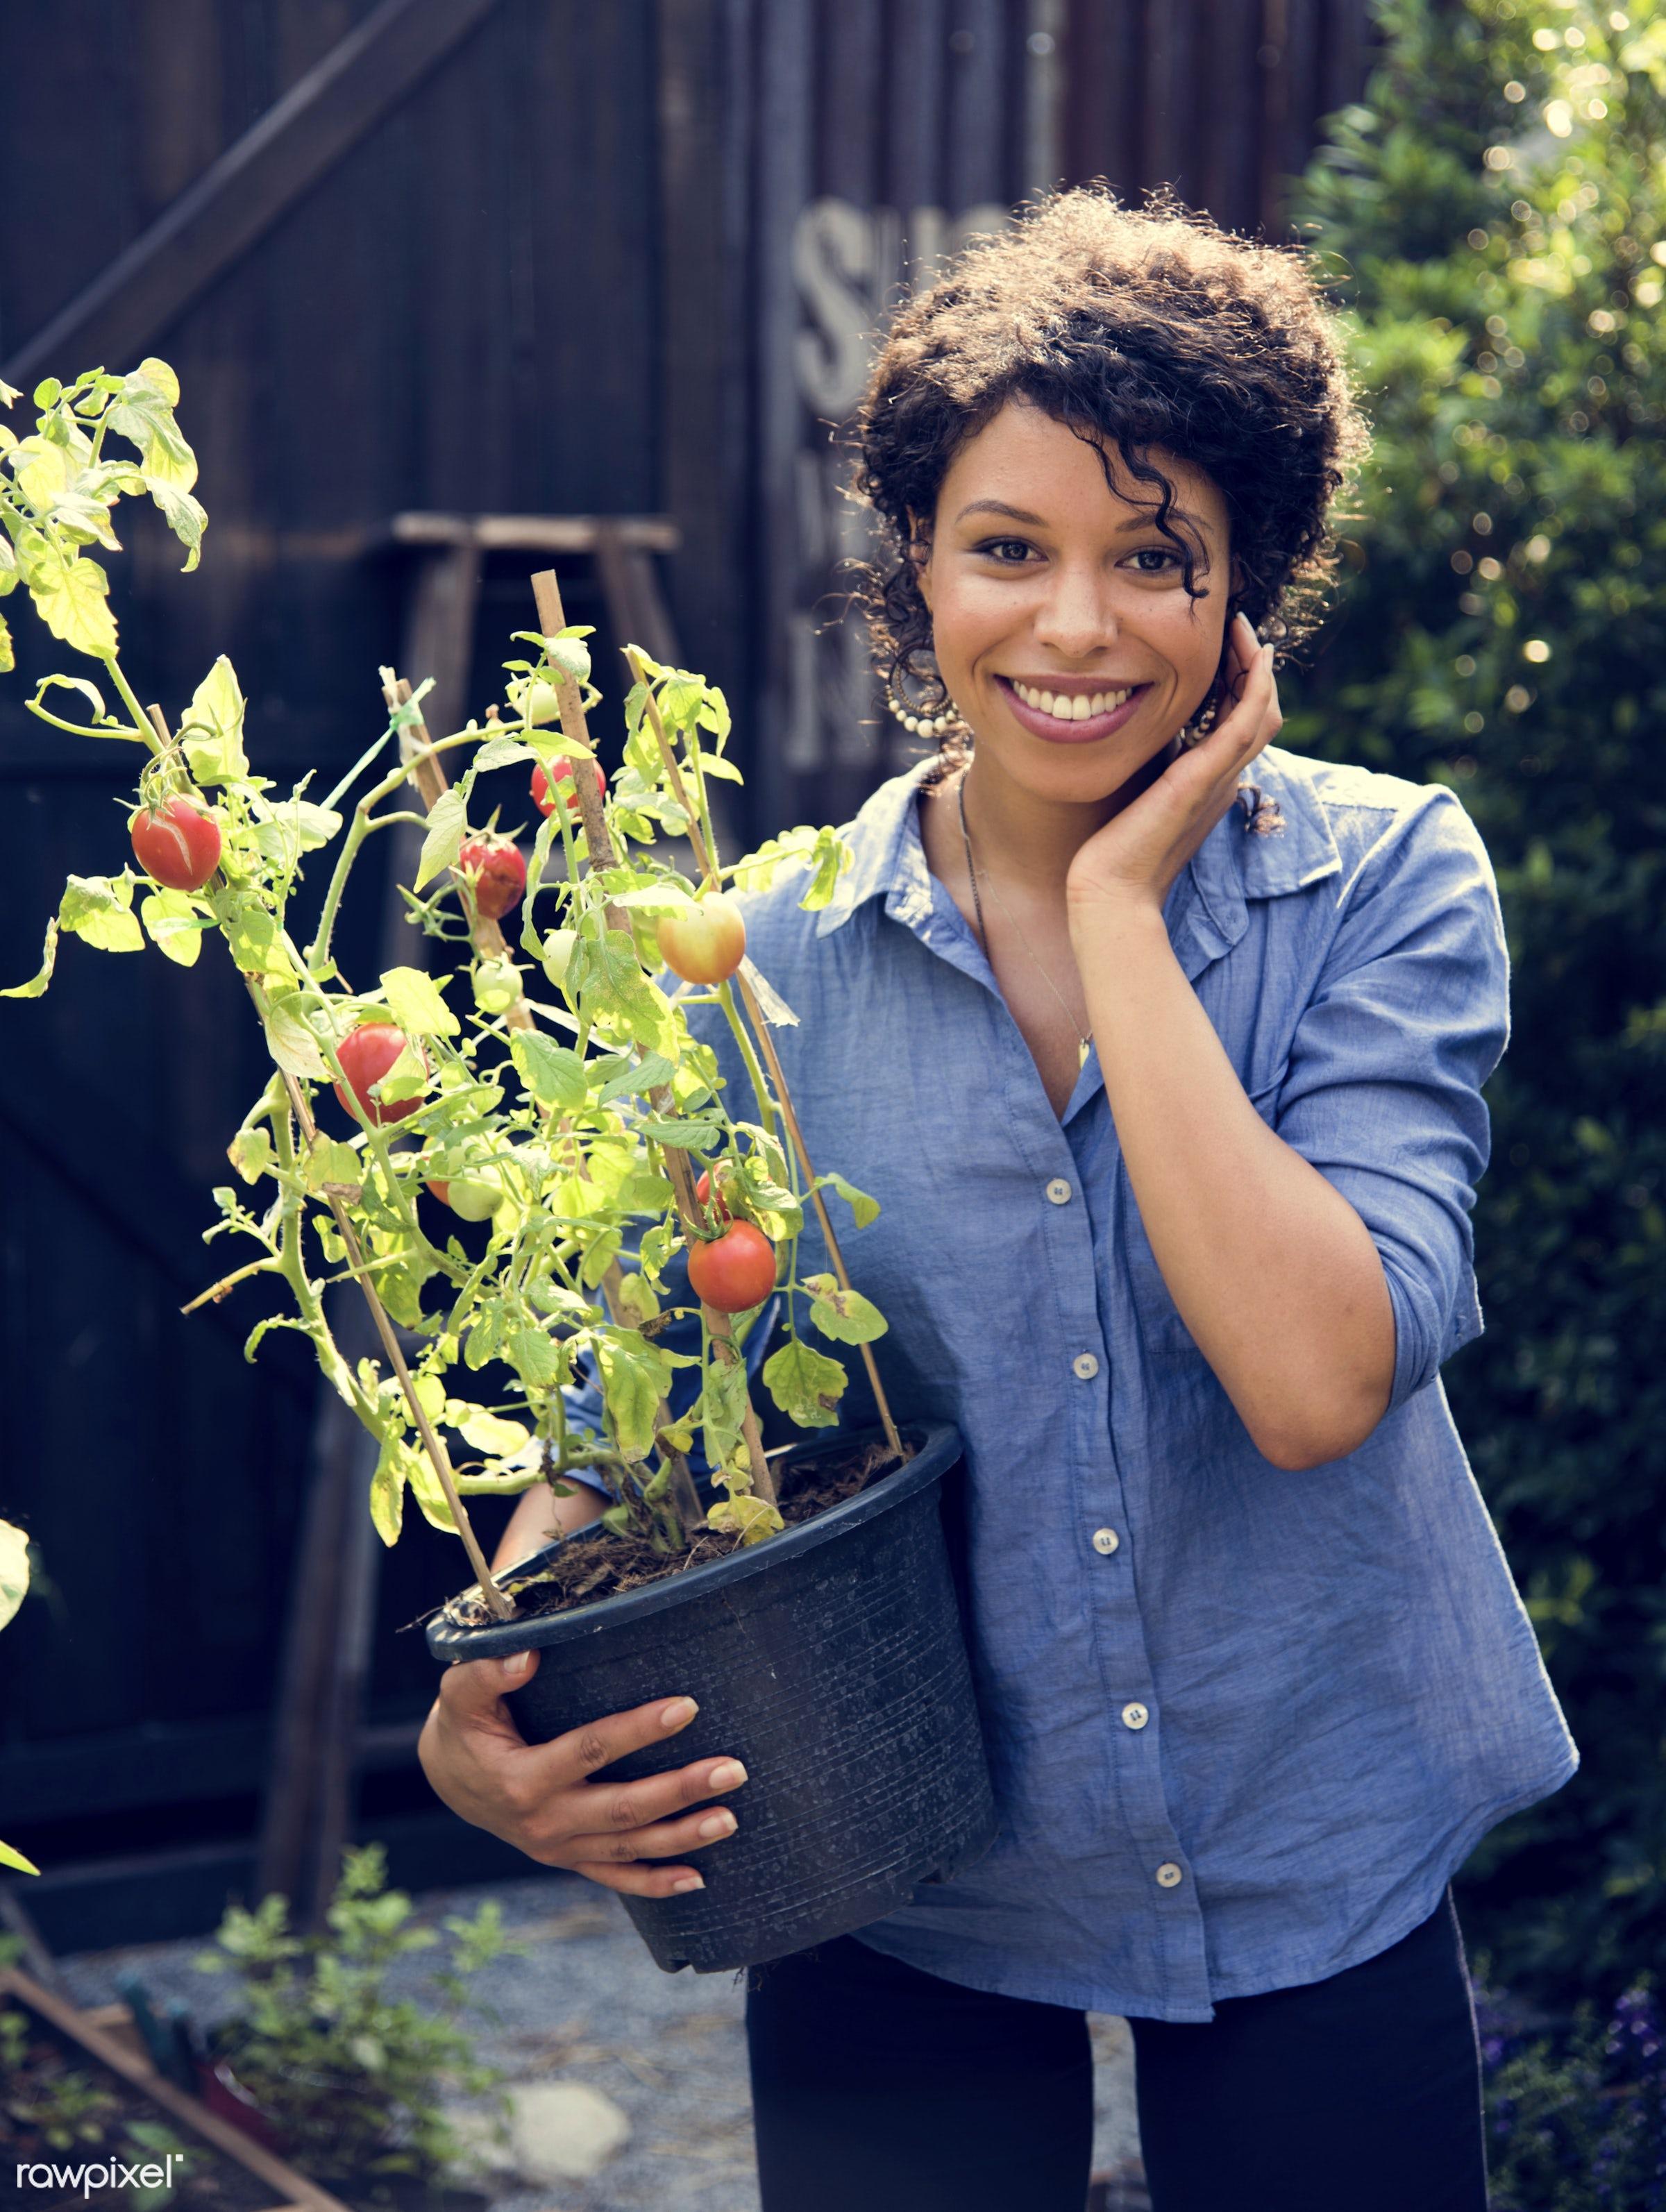 countryside, plant, person, greenhouse, botany, shrub, botanical, plantation, caucasian, tree, nature, farmer, woman,...